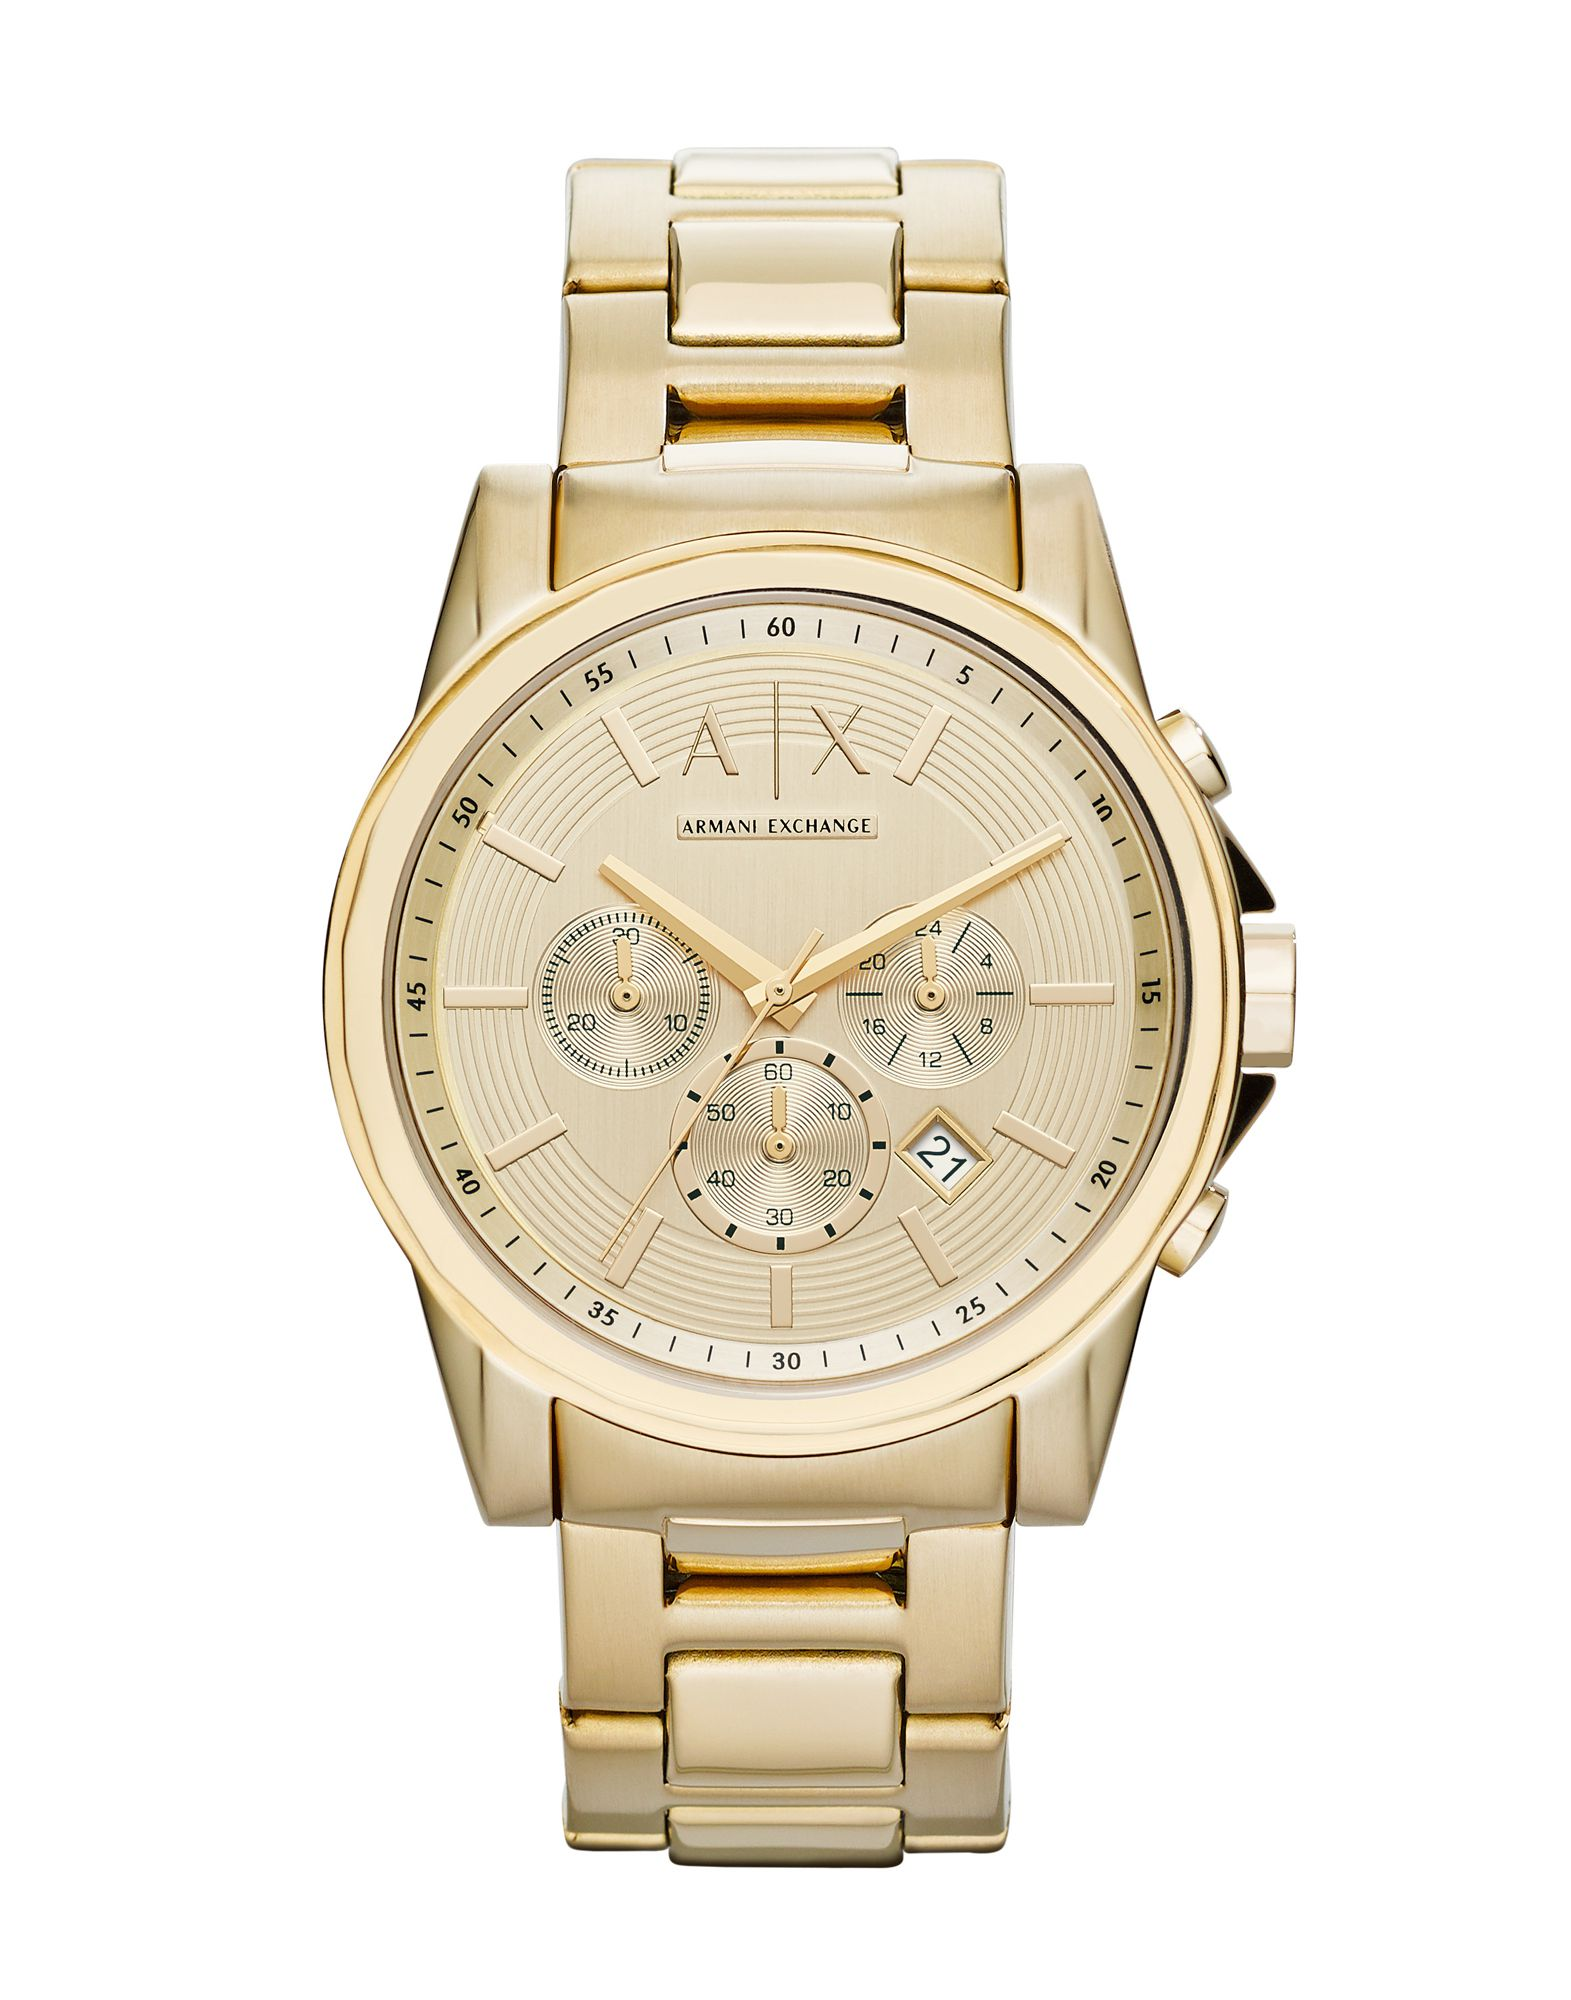 ARMANI EXCHANGE メンズ 腕時計 ゴールド ステンレススチール